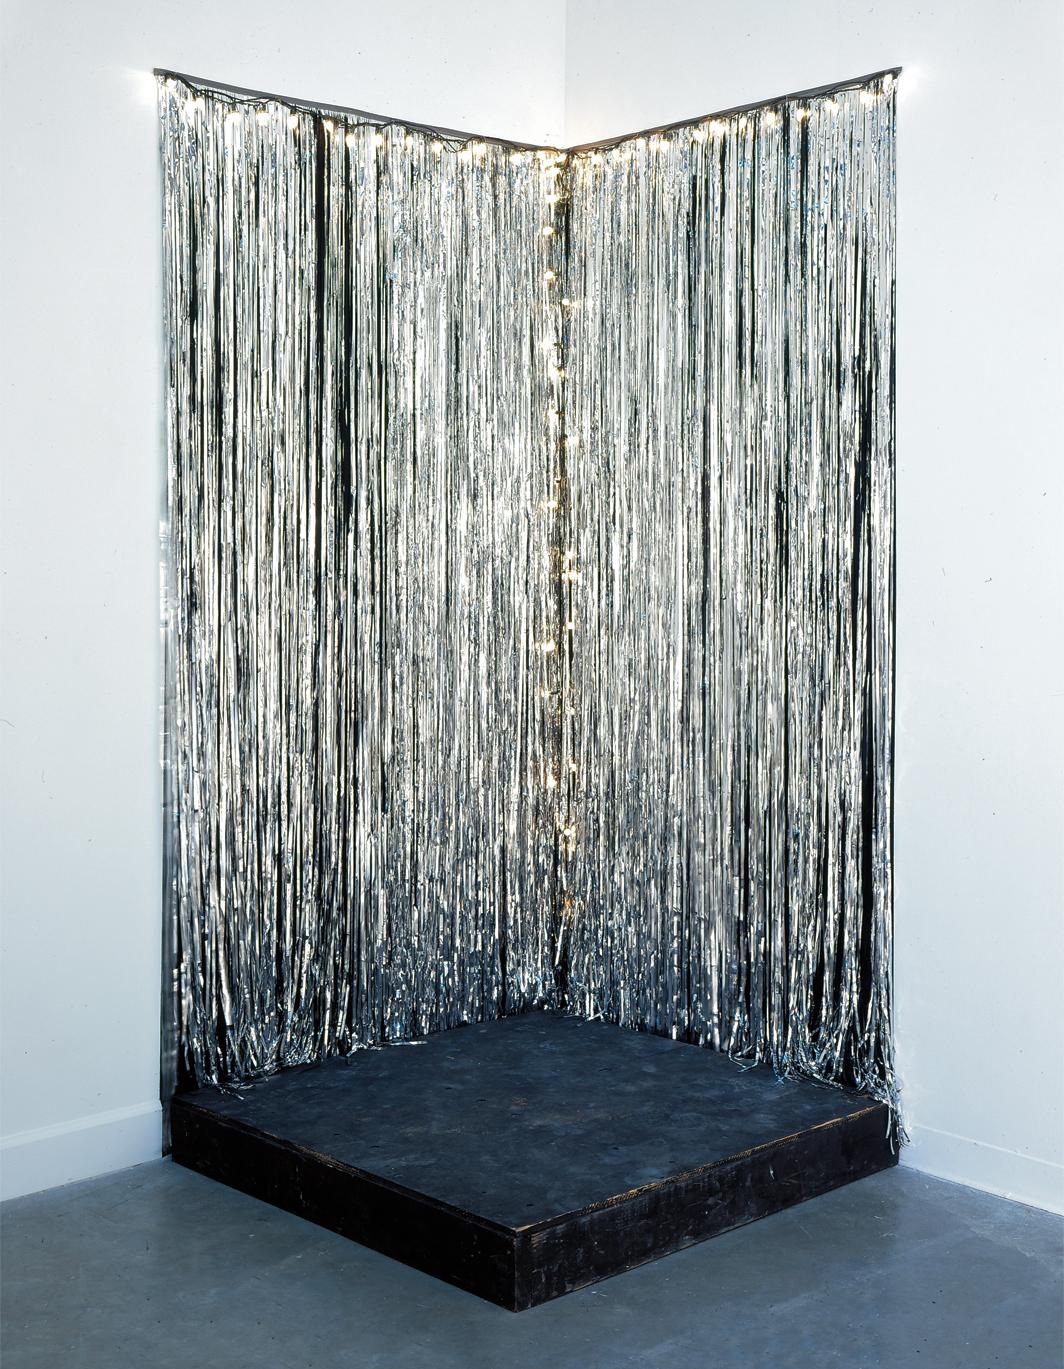 Jack Pierson, Silver Jackie, 1991, plywood, silver Mylar, Christmas lights, 96 × 48 1⁄4 × 48